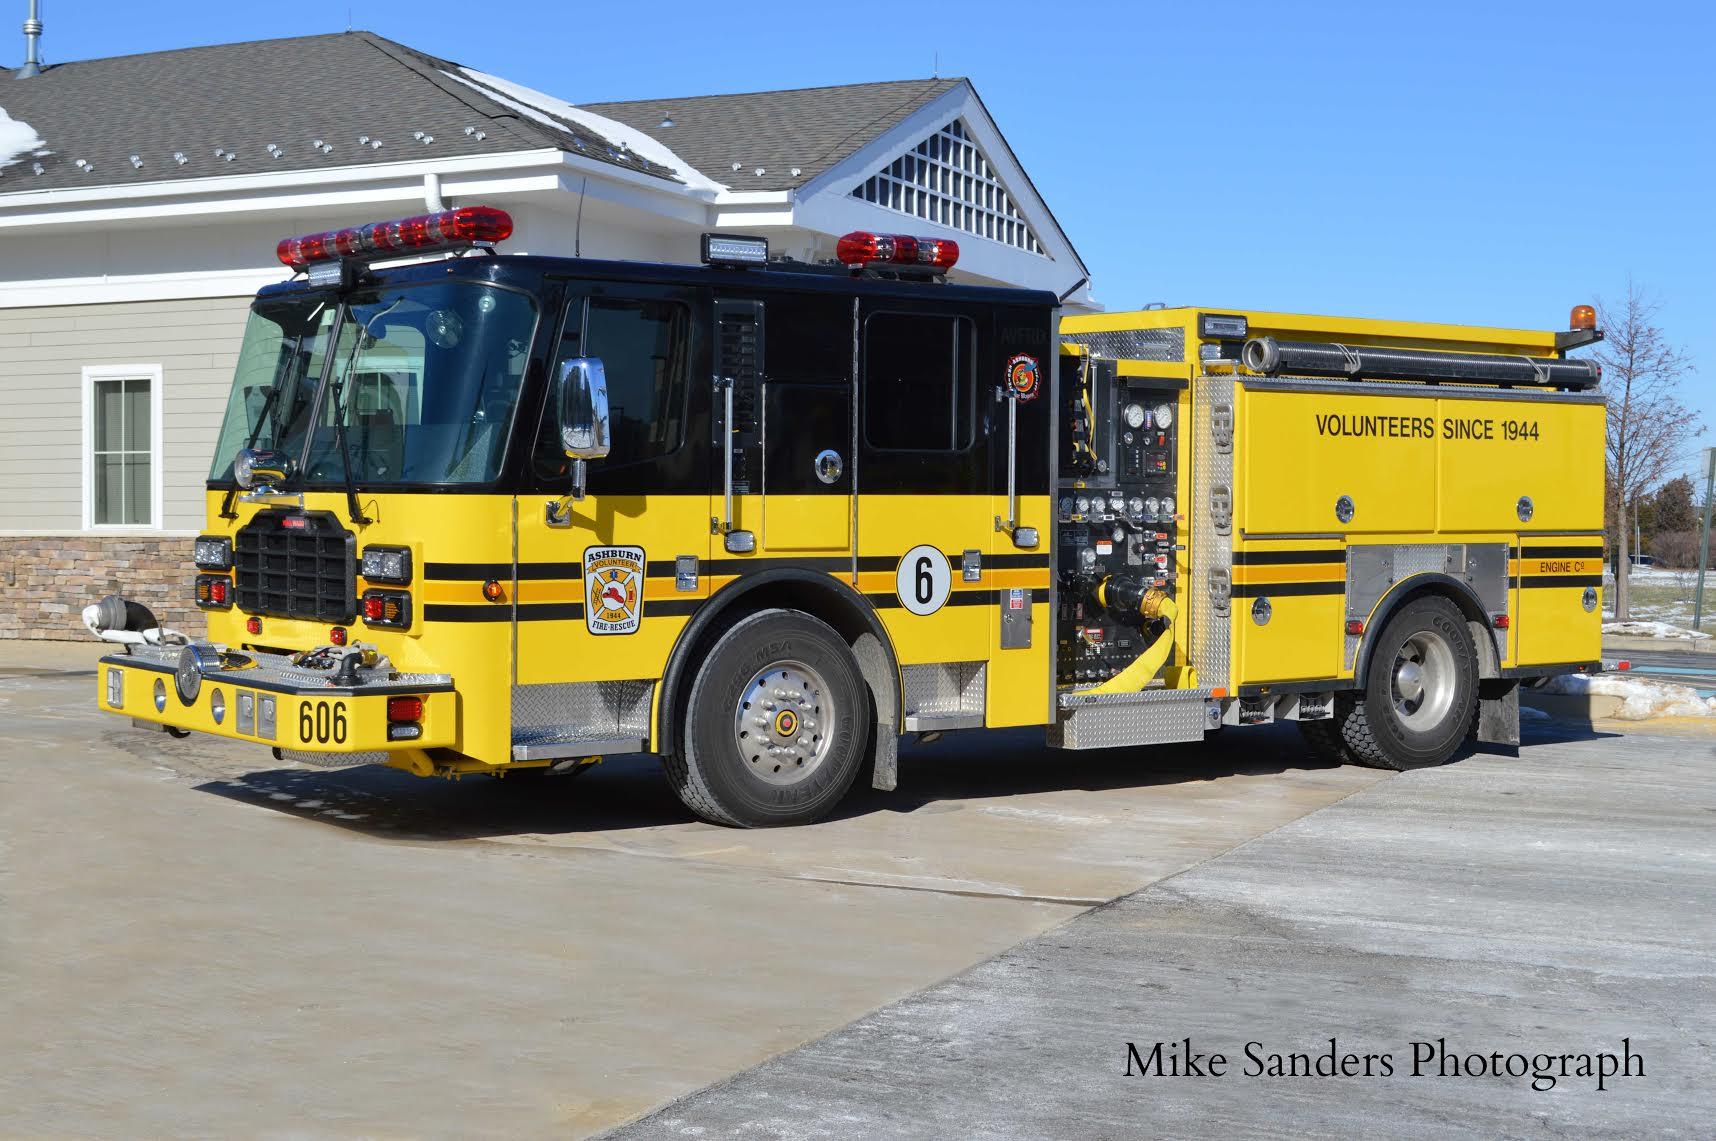 Ashburn Volunteer Fire Engine 606 - Loudoun County, VA